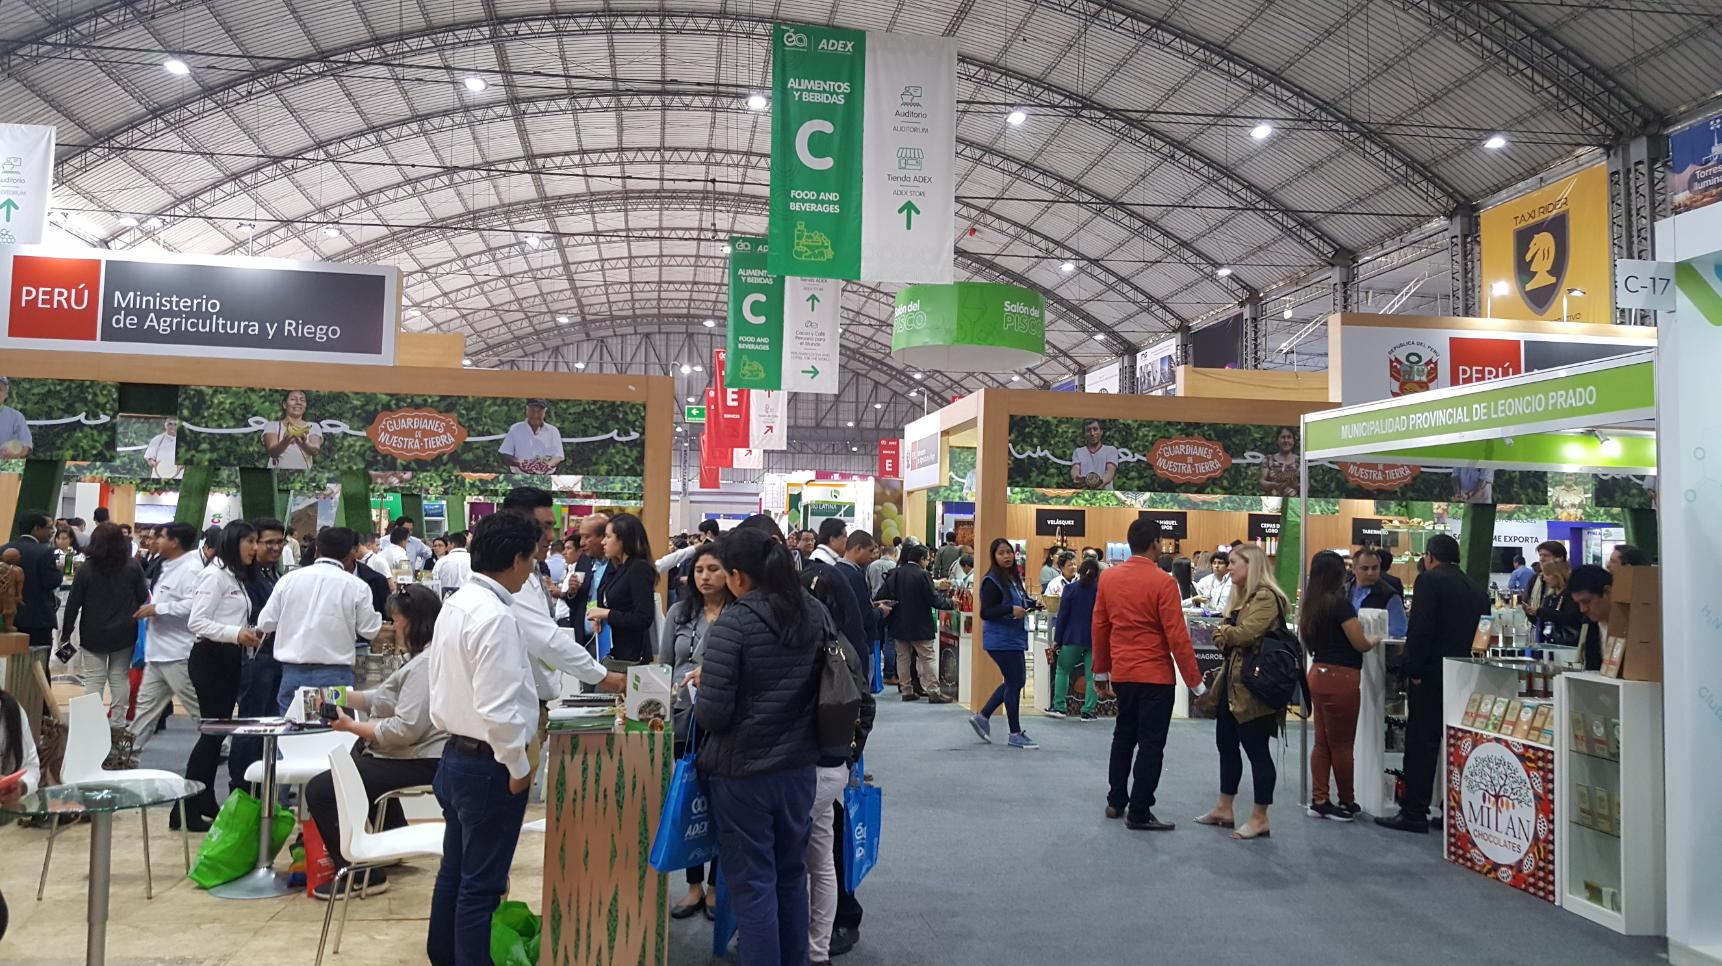 2019 Expoalimentaria, Peru site 03